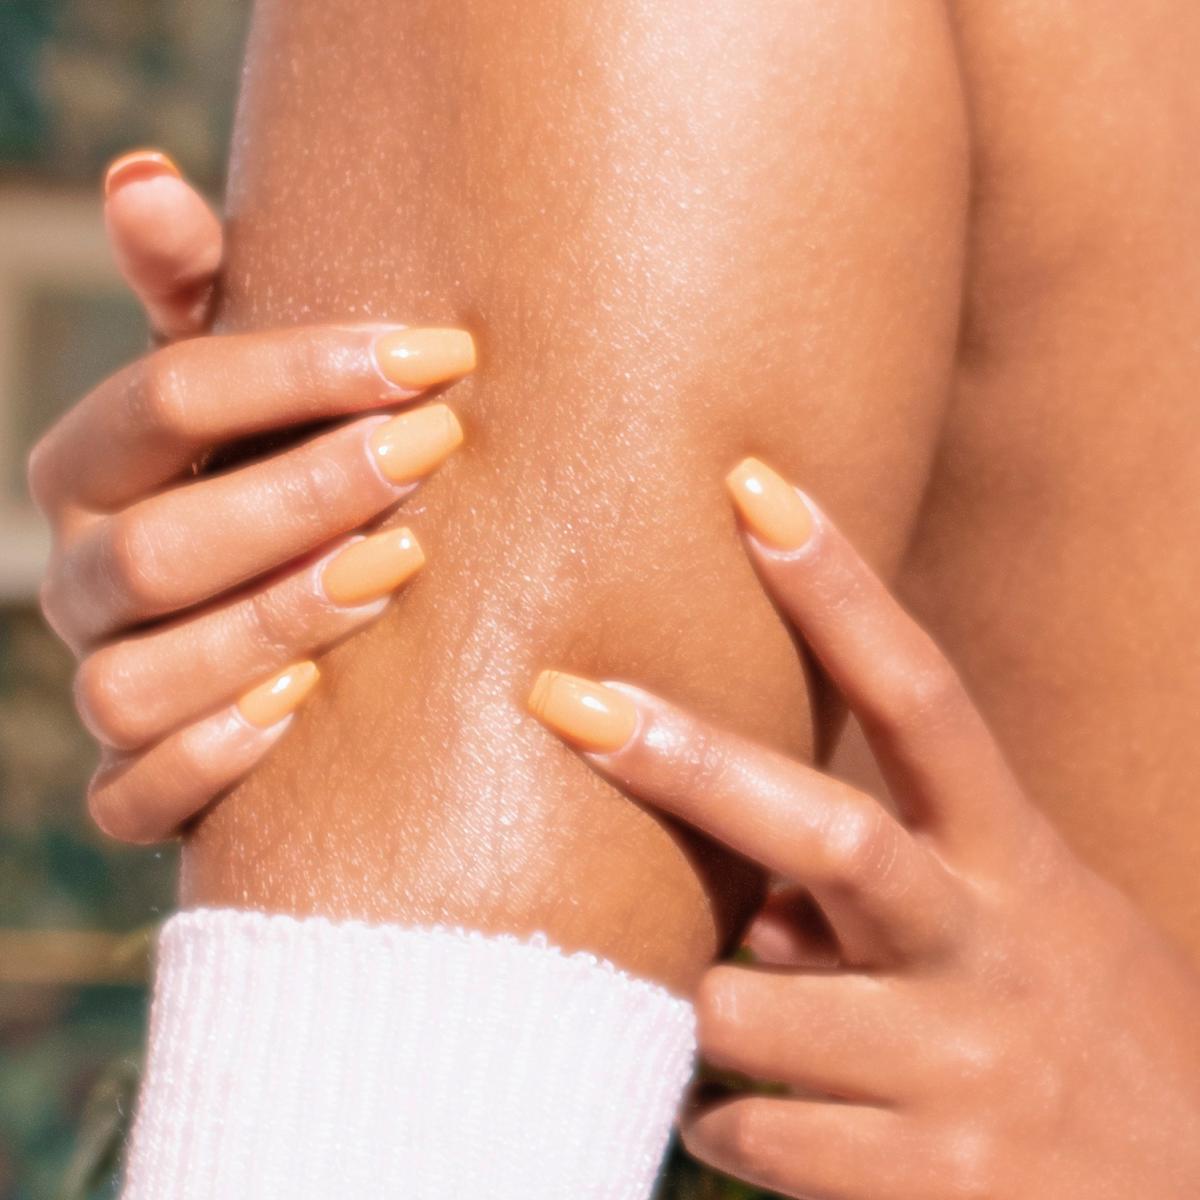 women's leg showing leg hair